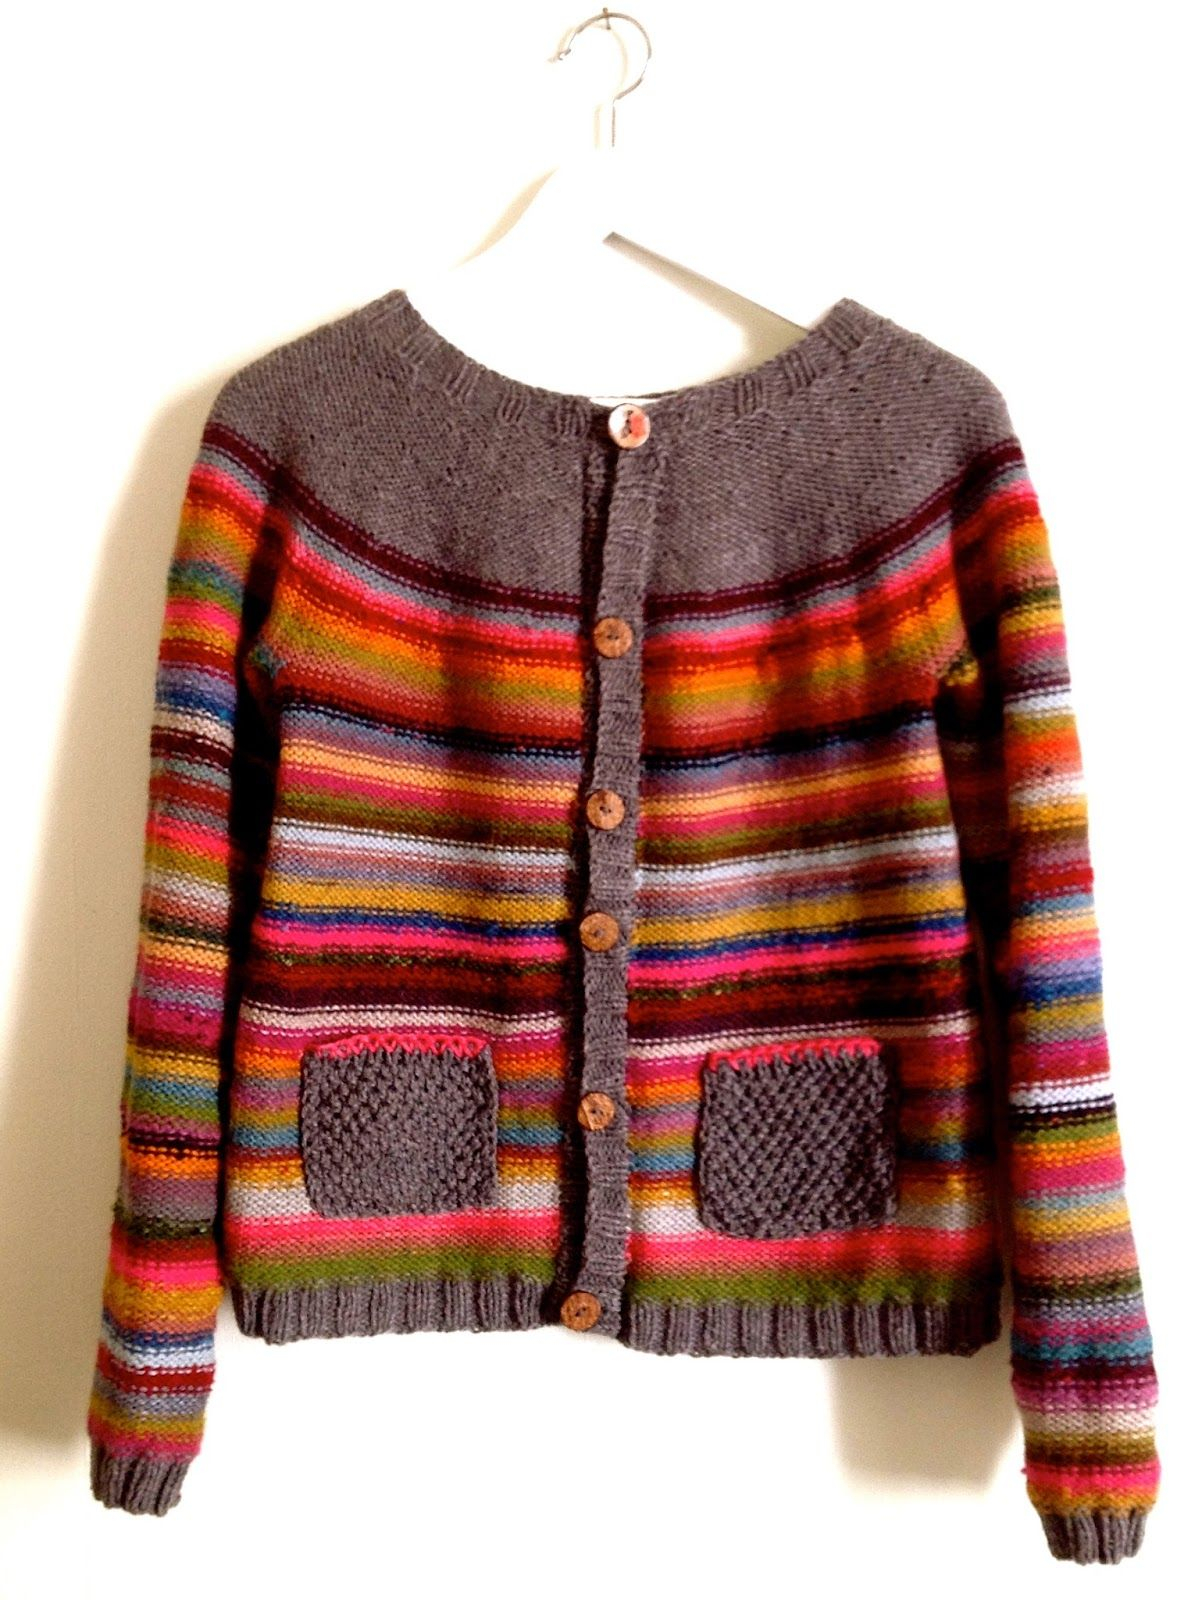 Horse sweater Yarn: Different Alpaca and wool yarns Ne edles: 3mm and 4 mm Brynja Yarn: Drops Alpaca Needles: 3mm and 4mm ...